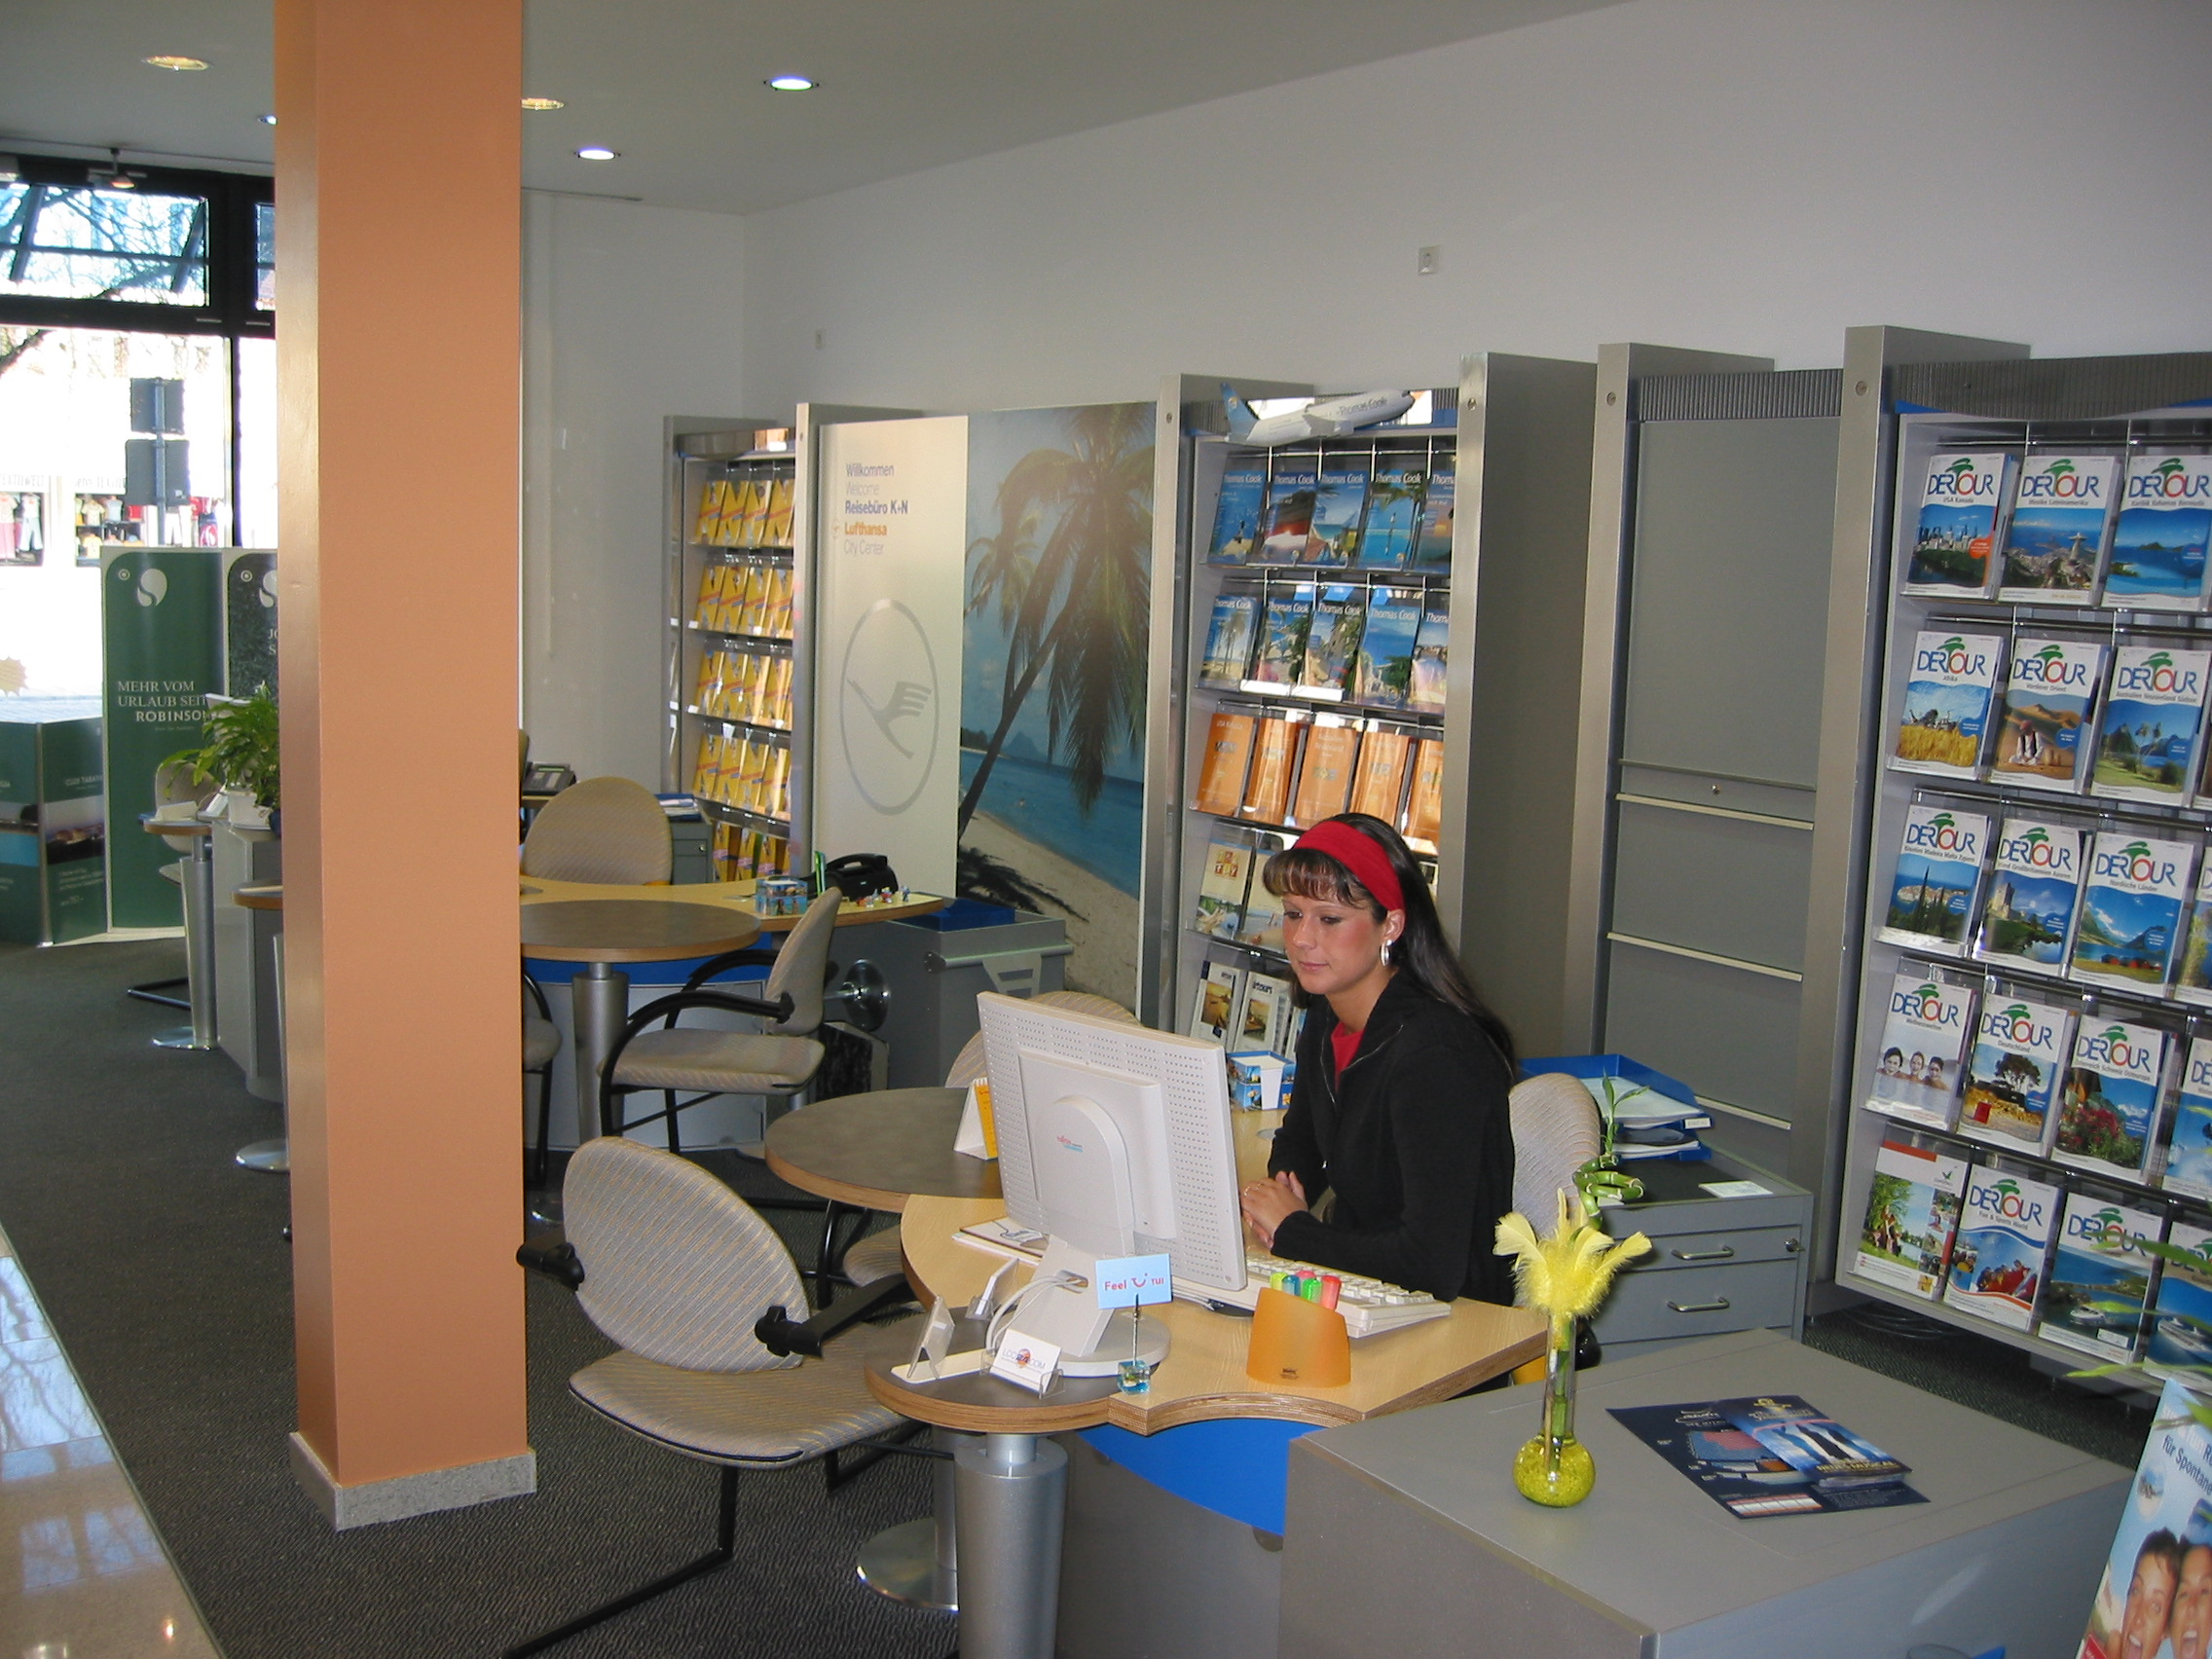 Lufthansa City Center Reisebüro K+N